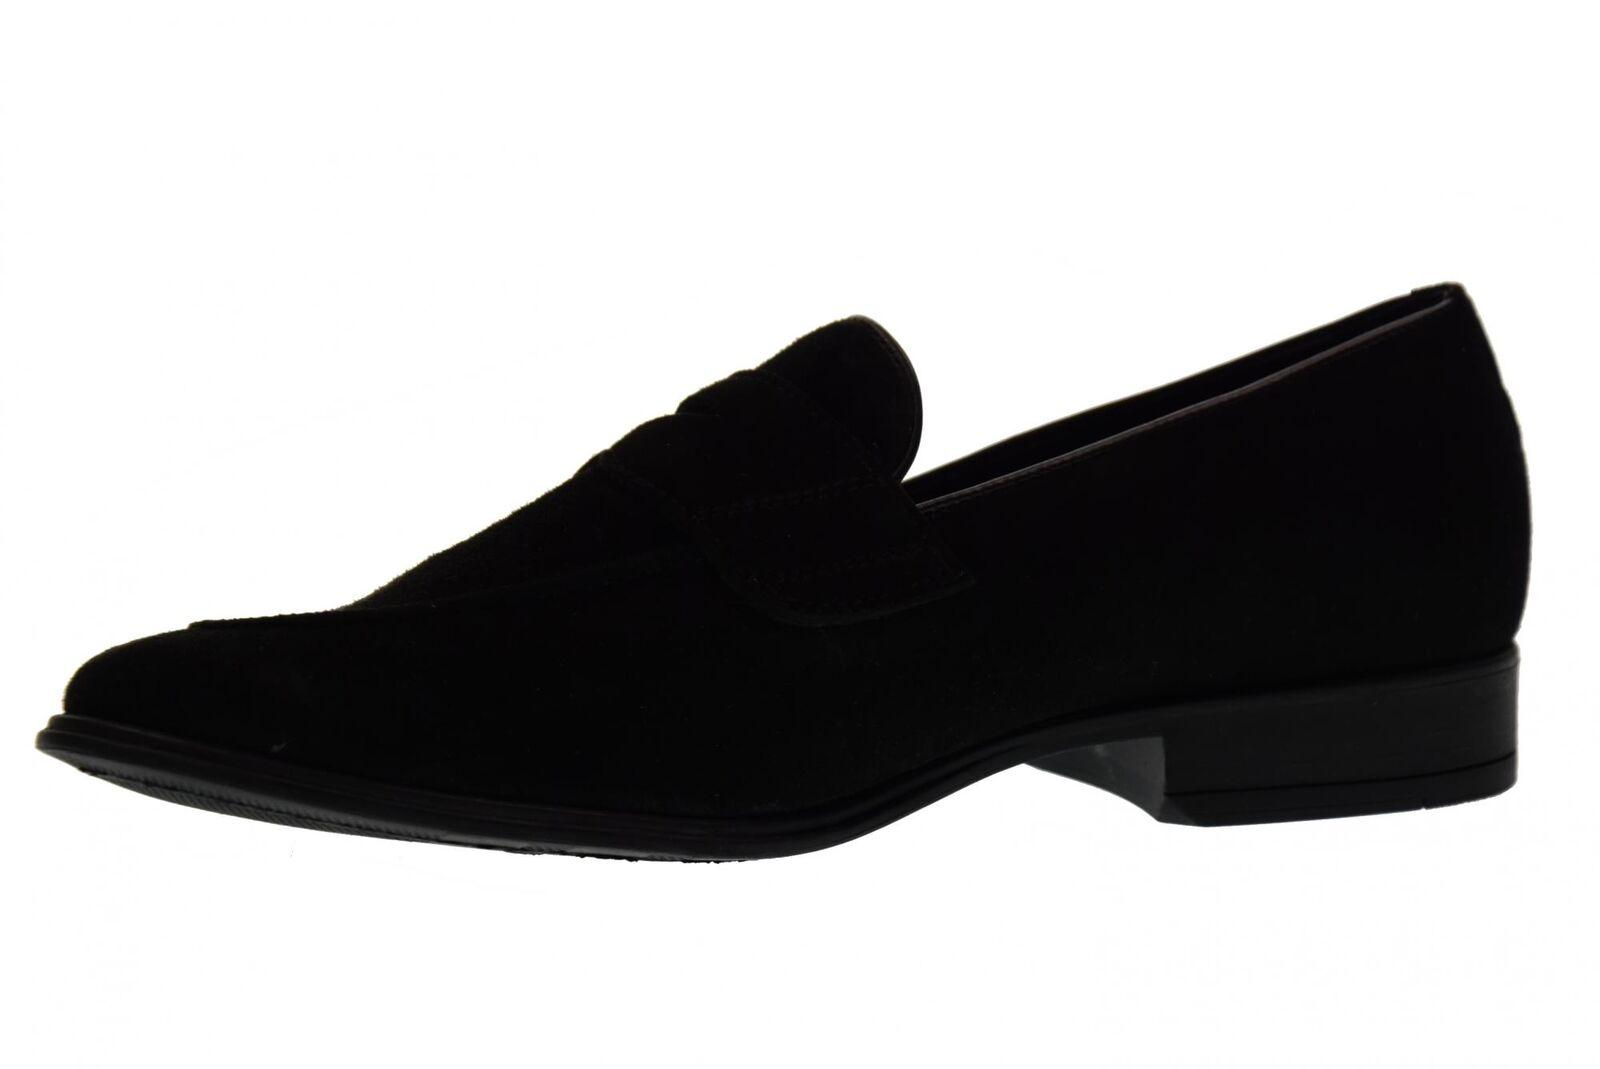 Antica Cuoieria Mannmüßiggänger Schuhe 19763-A-S67 P18g AMALFI BLACK P18g 19763-A-S67 666715